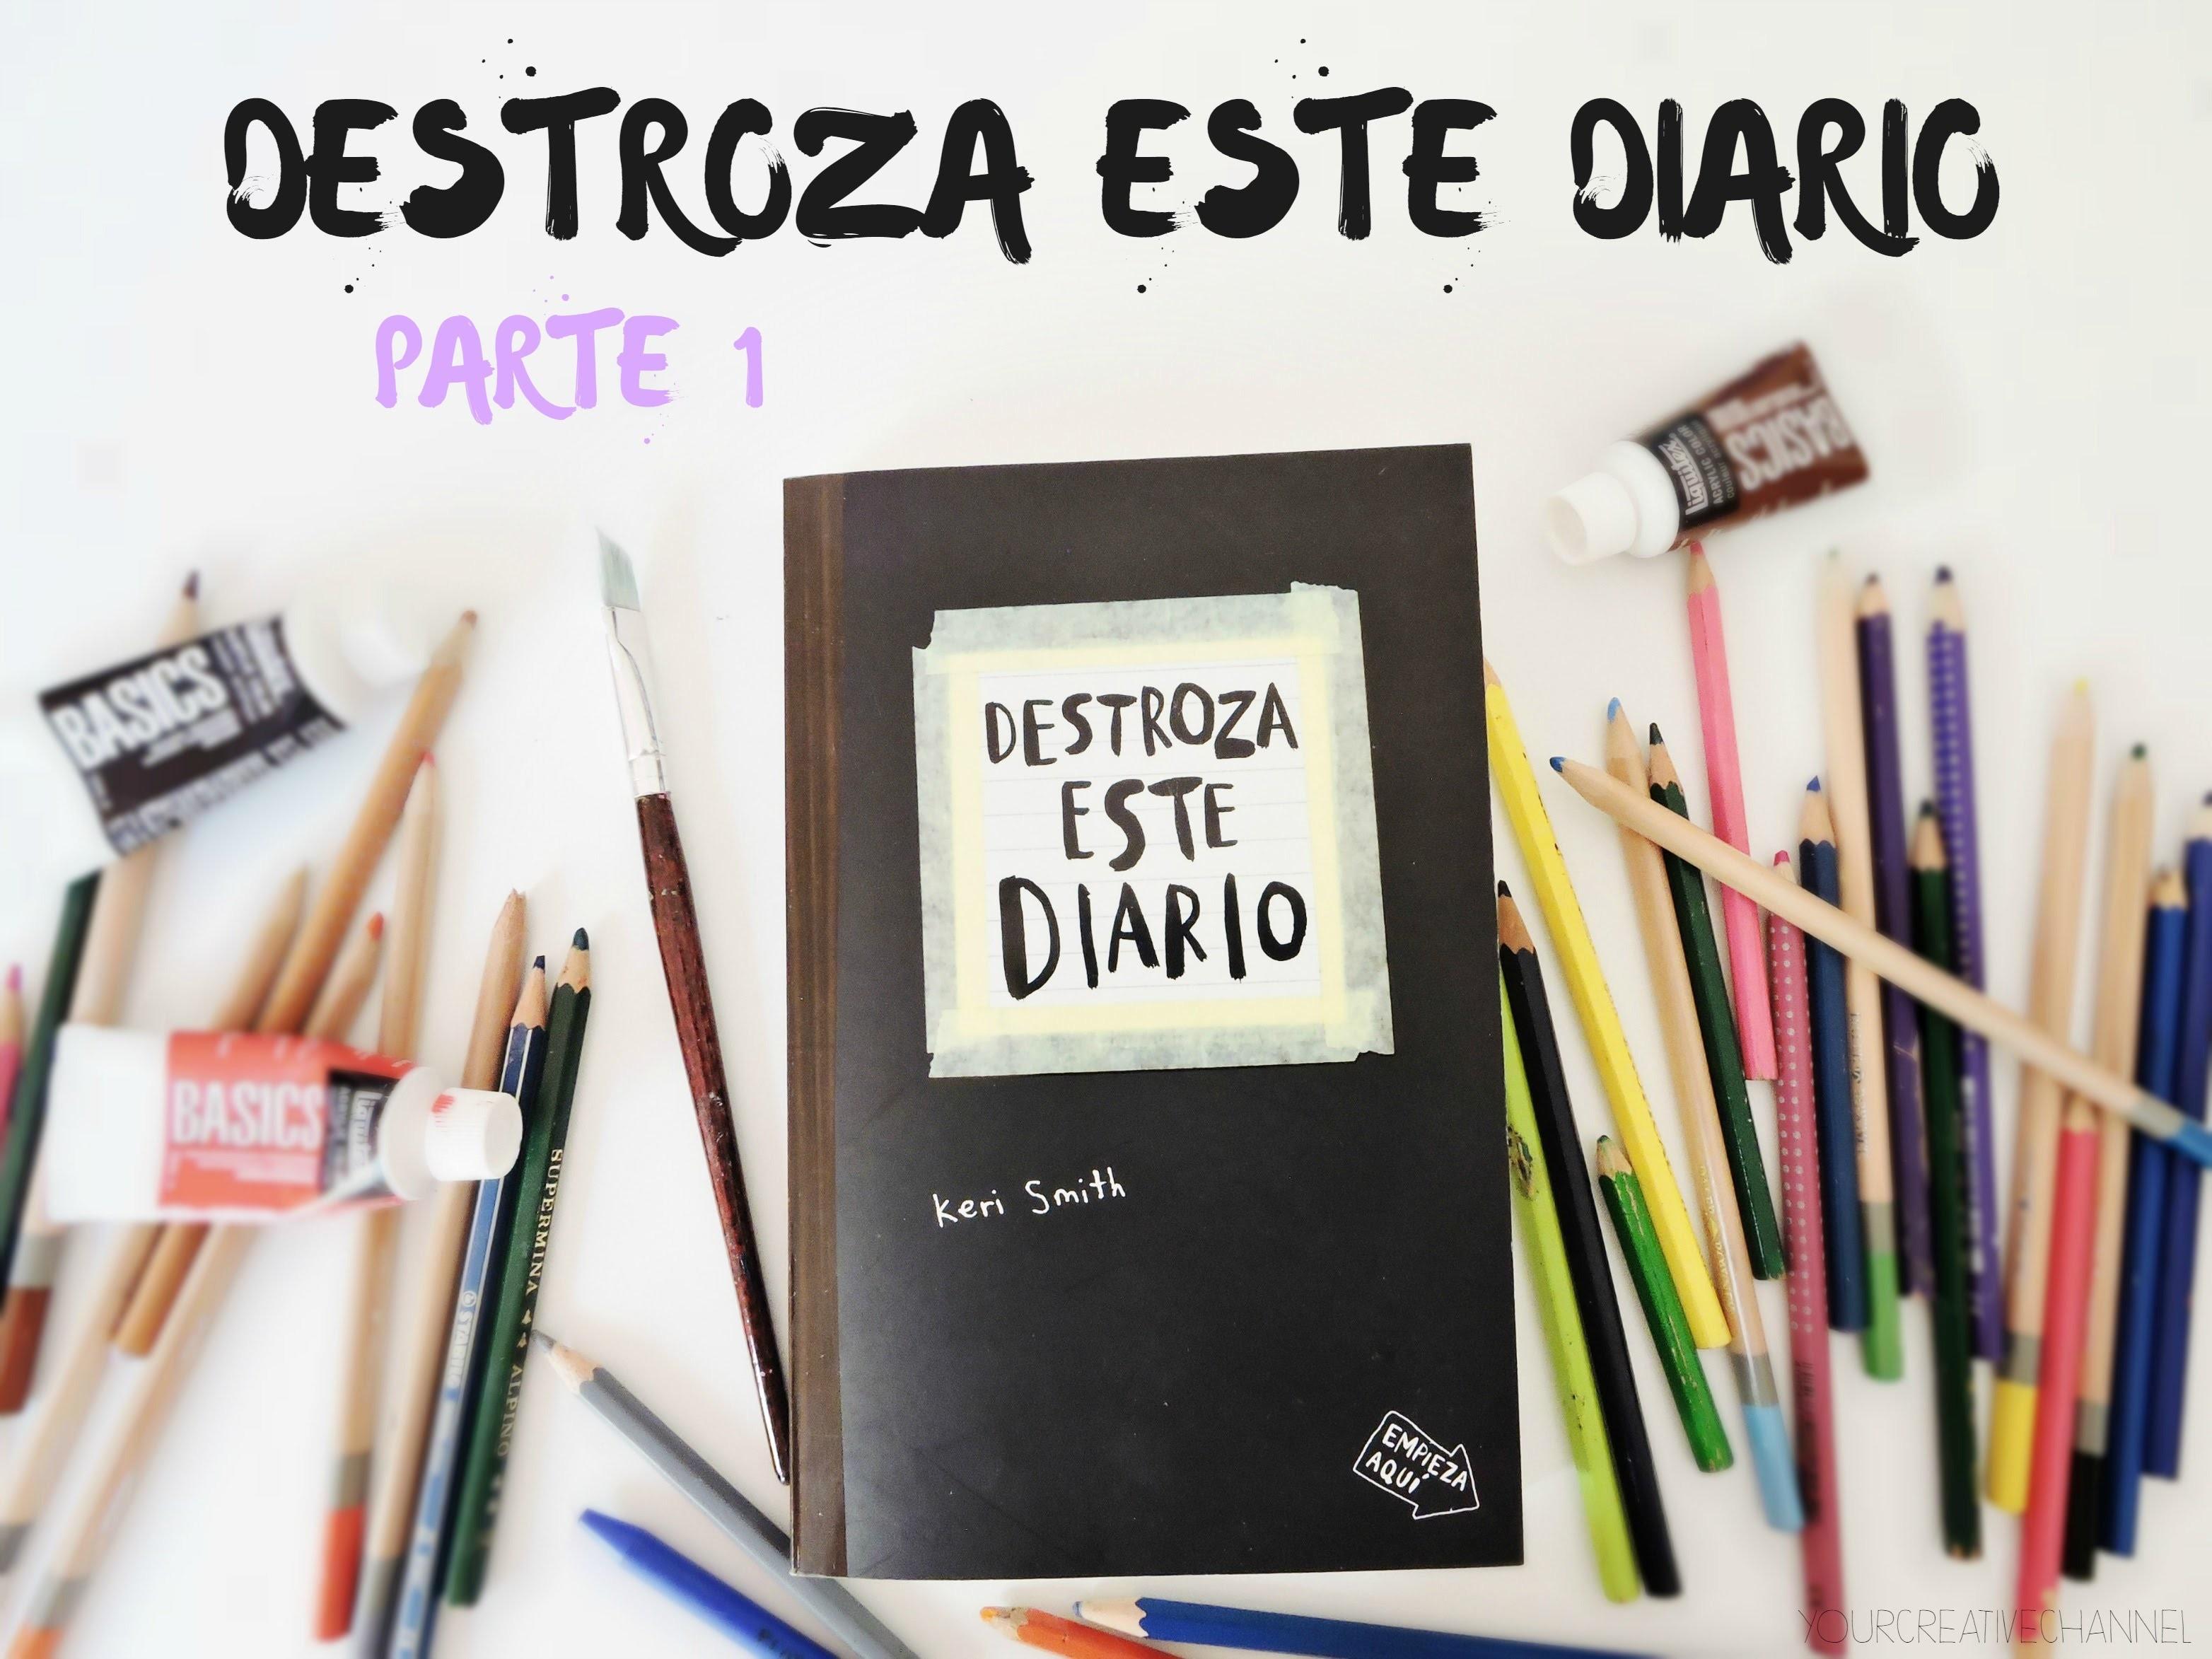 Destroza este diario (Parte1) Your Creative Channel